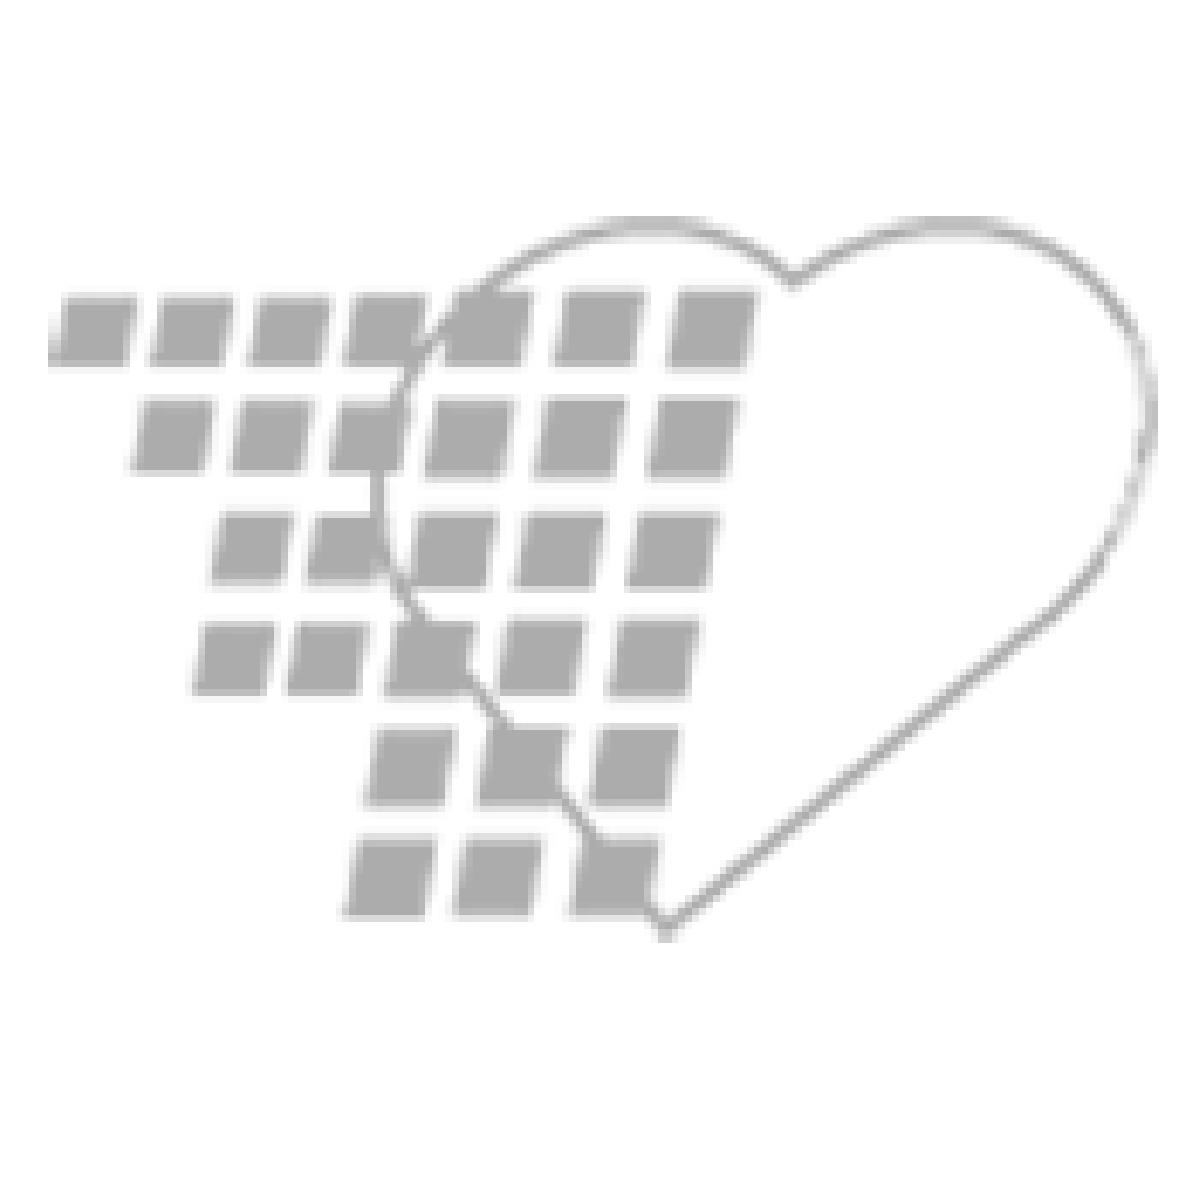 05-74-9204 Adult Disposable Bib - White